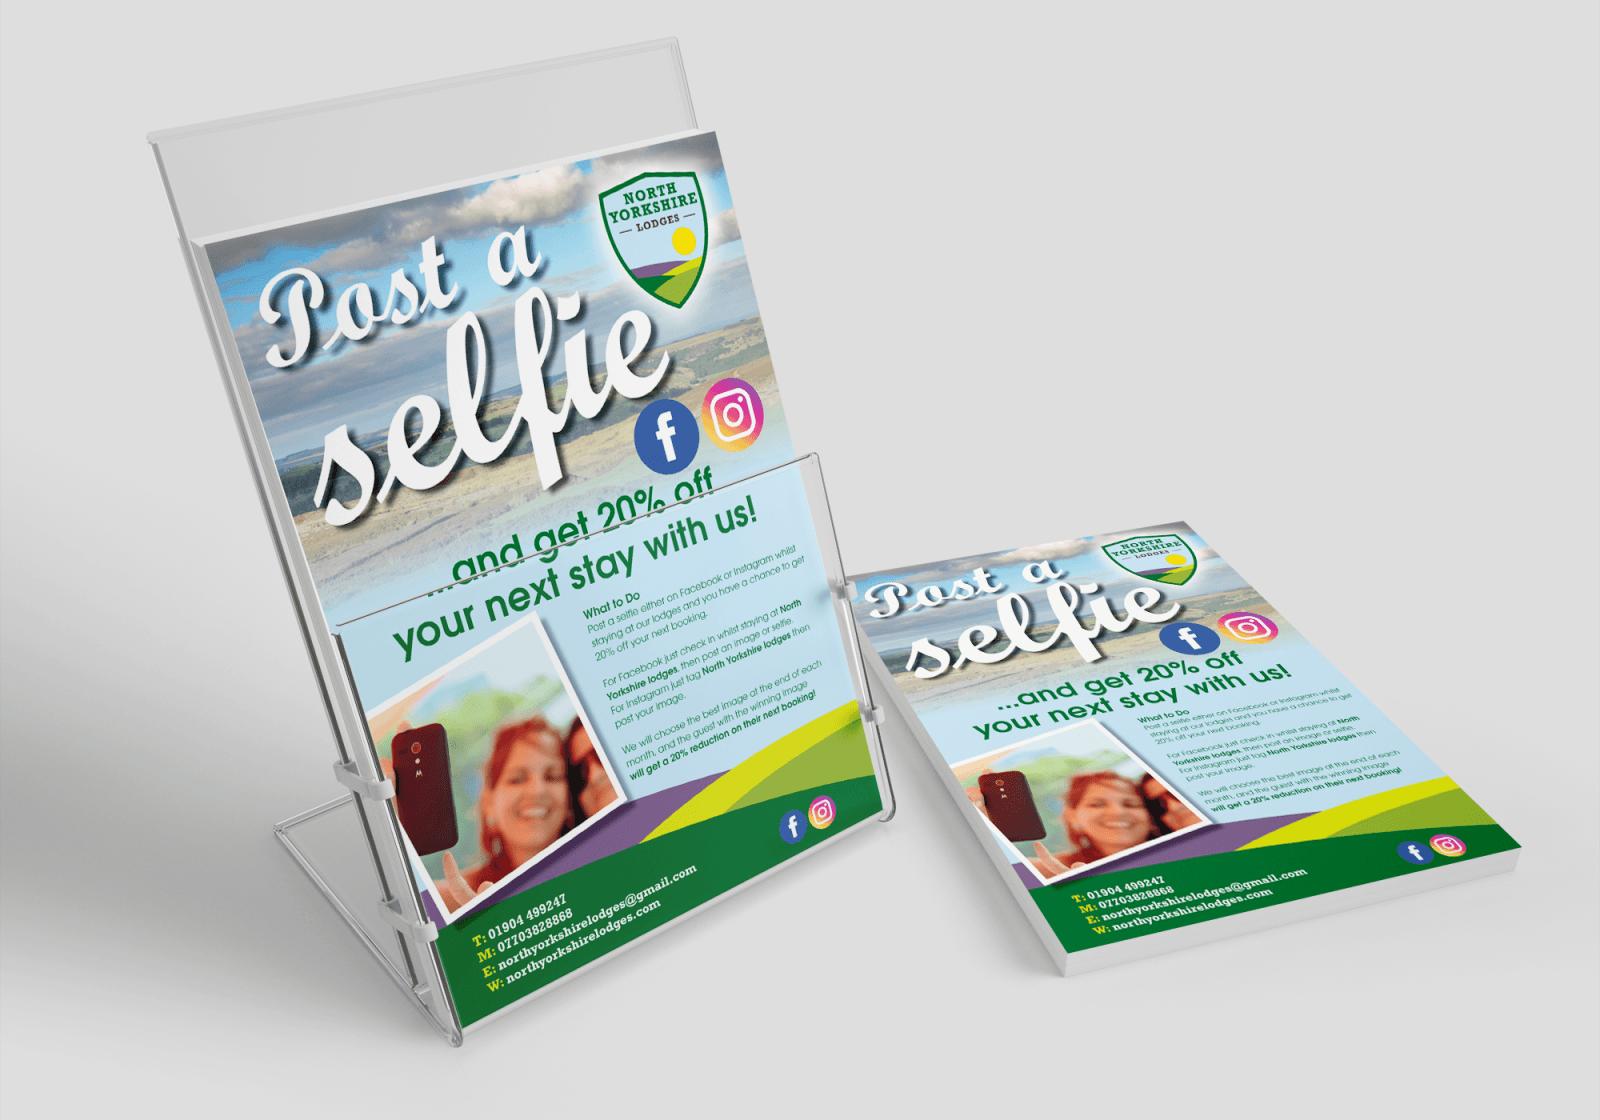 Leaflet for North Yorkshire Lodges about posting a selfie